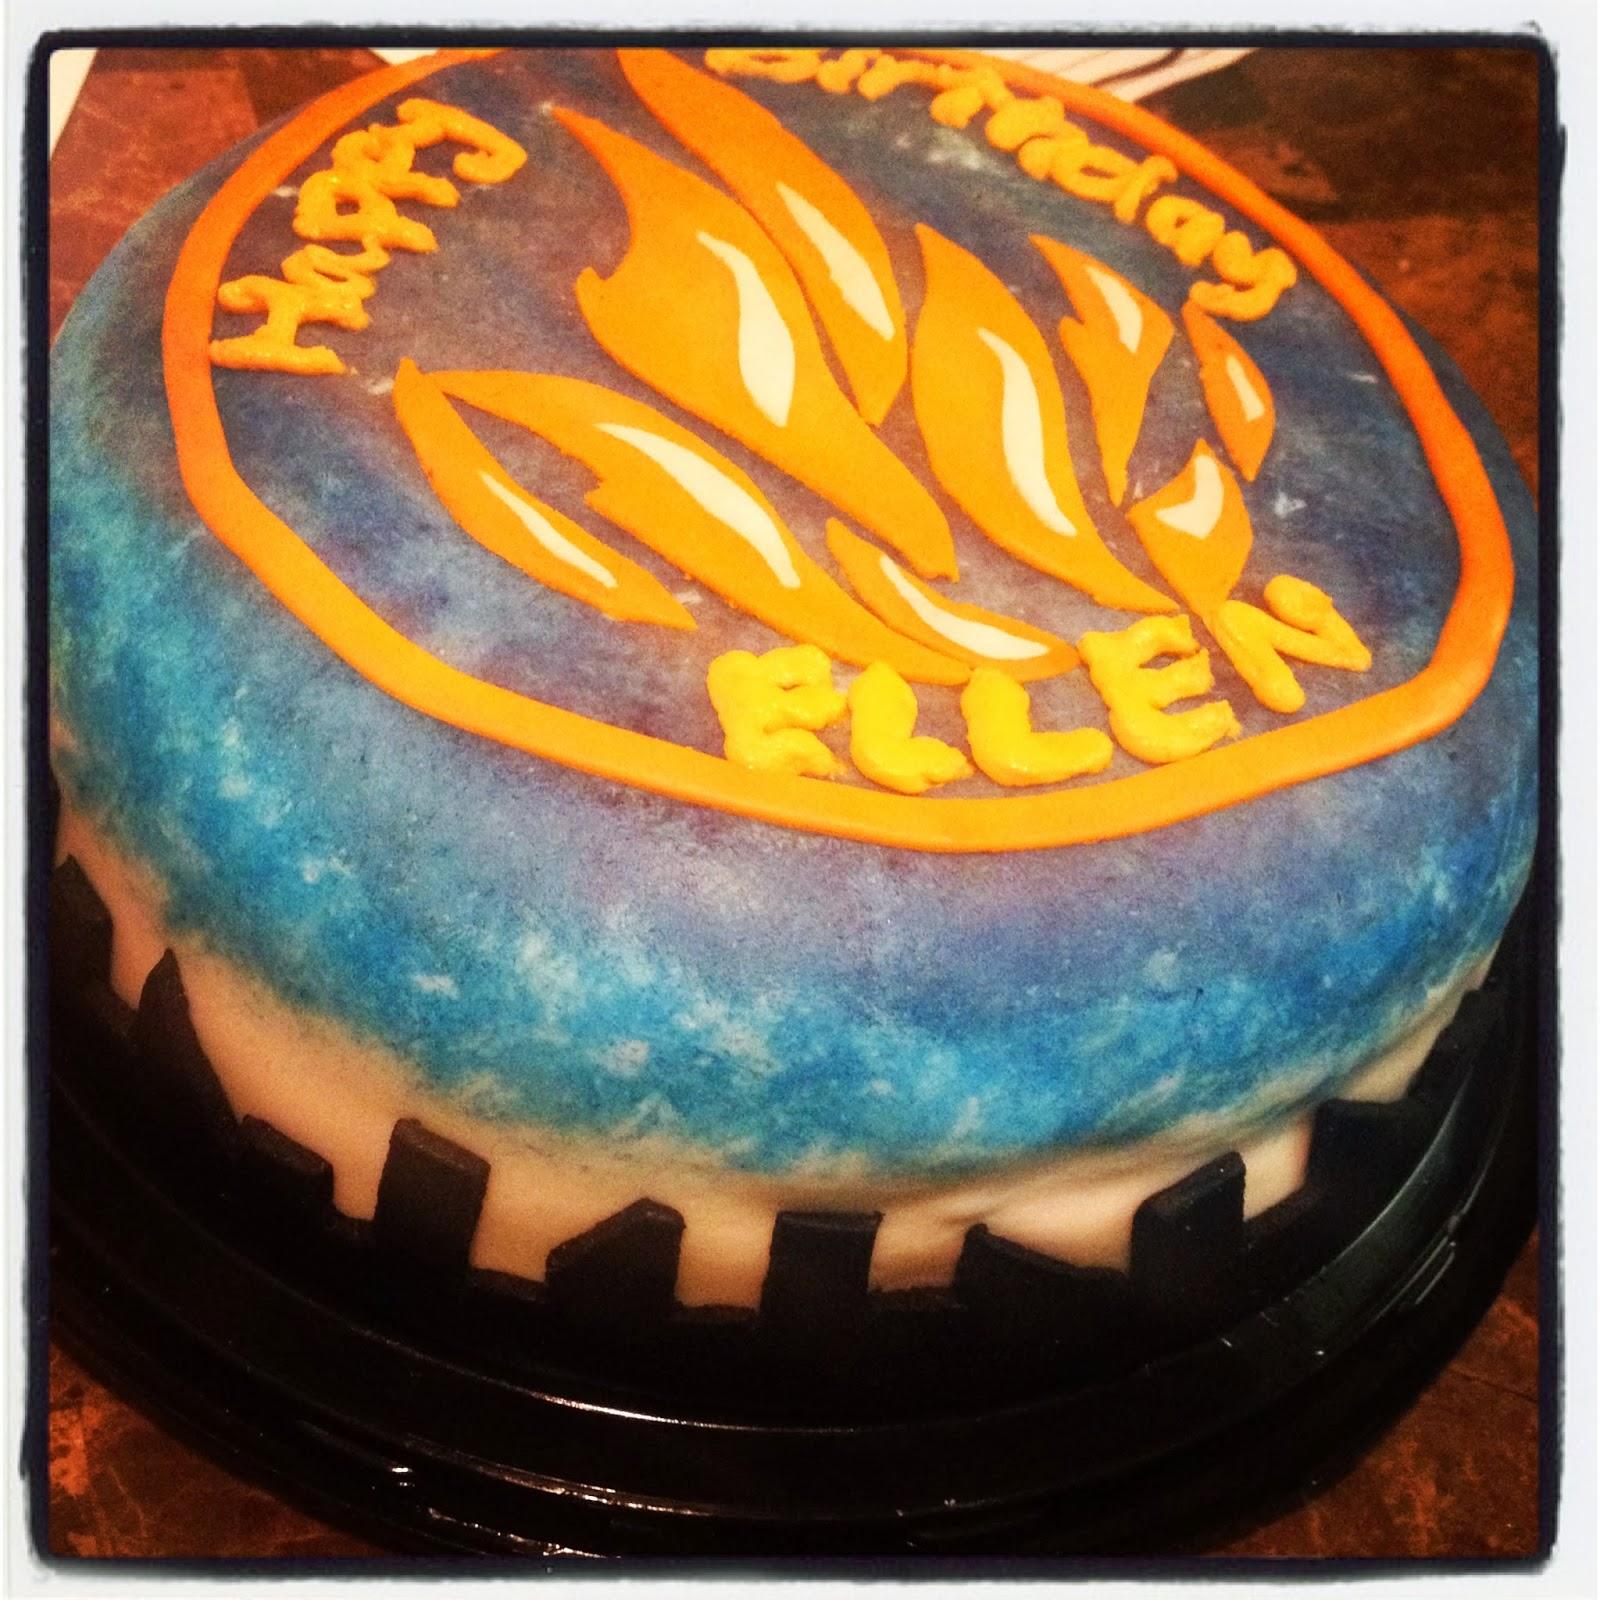 Sweetie Sweet Cupcakes Mario Birthday Cake Divergent Inspired Cake